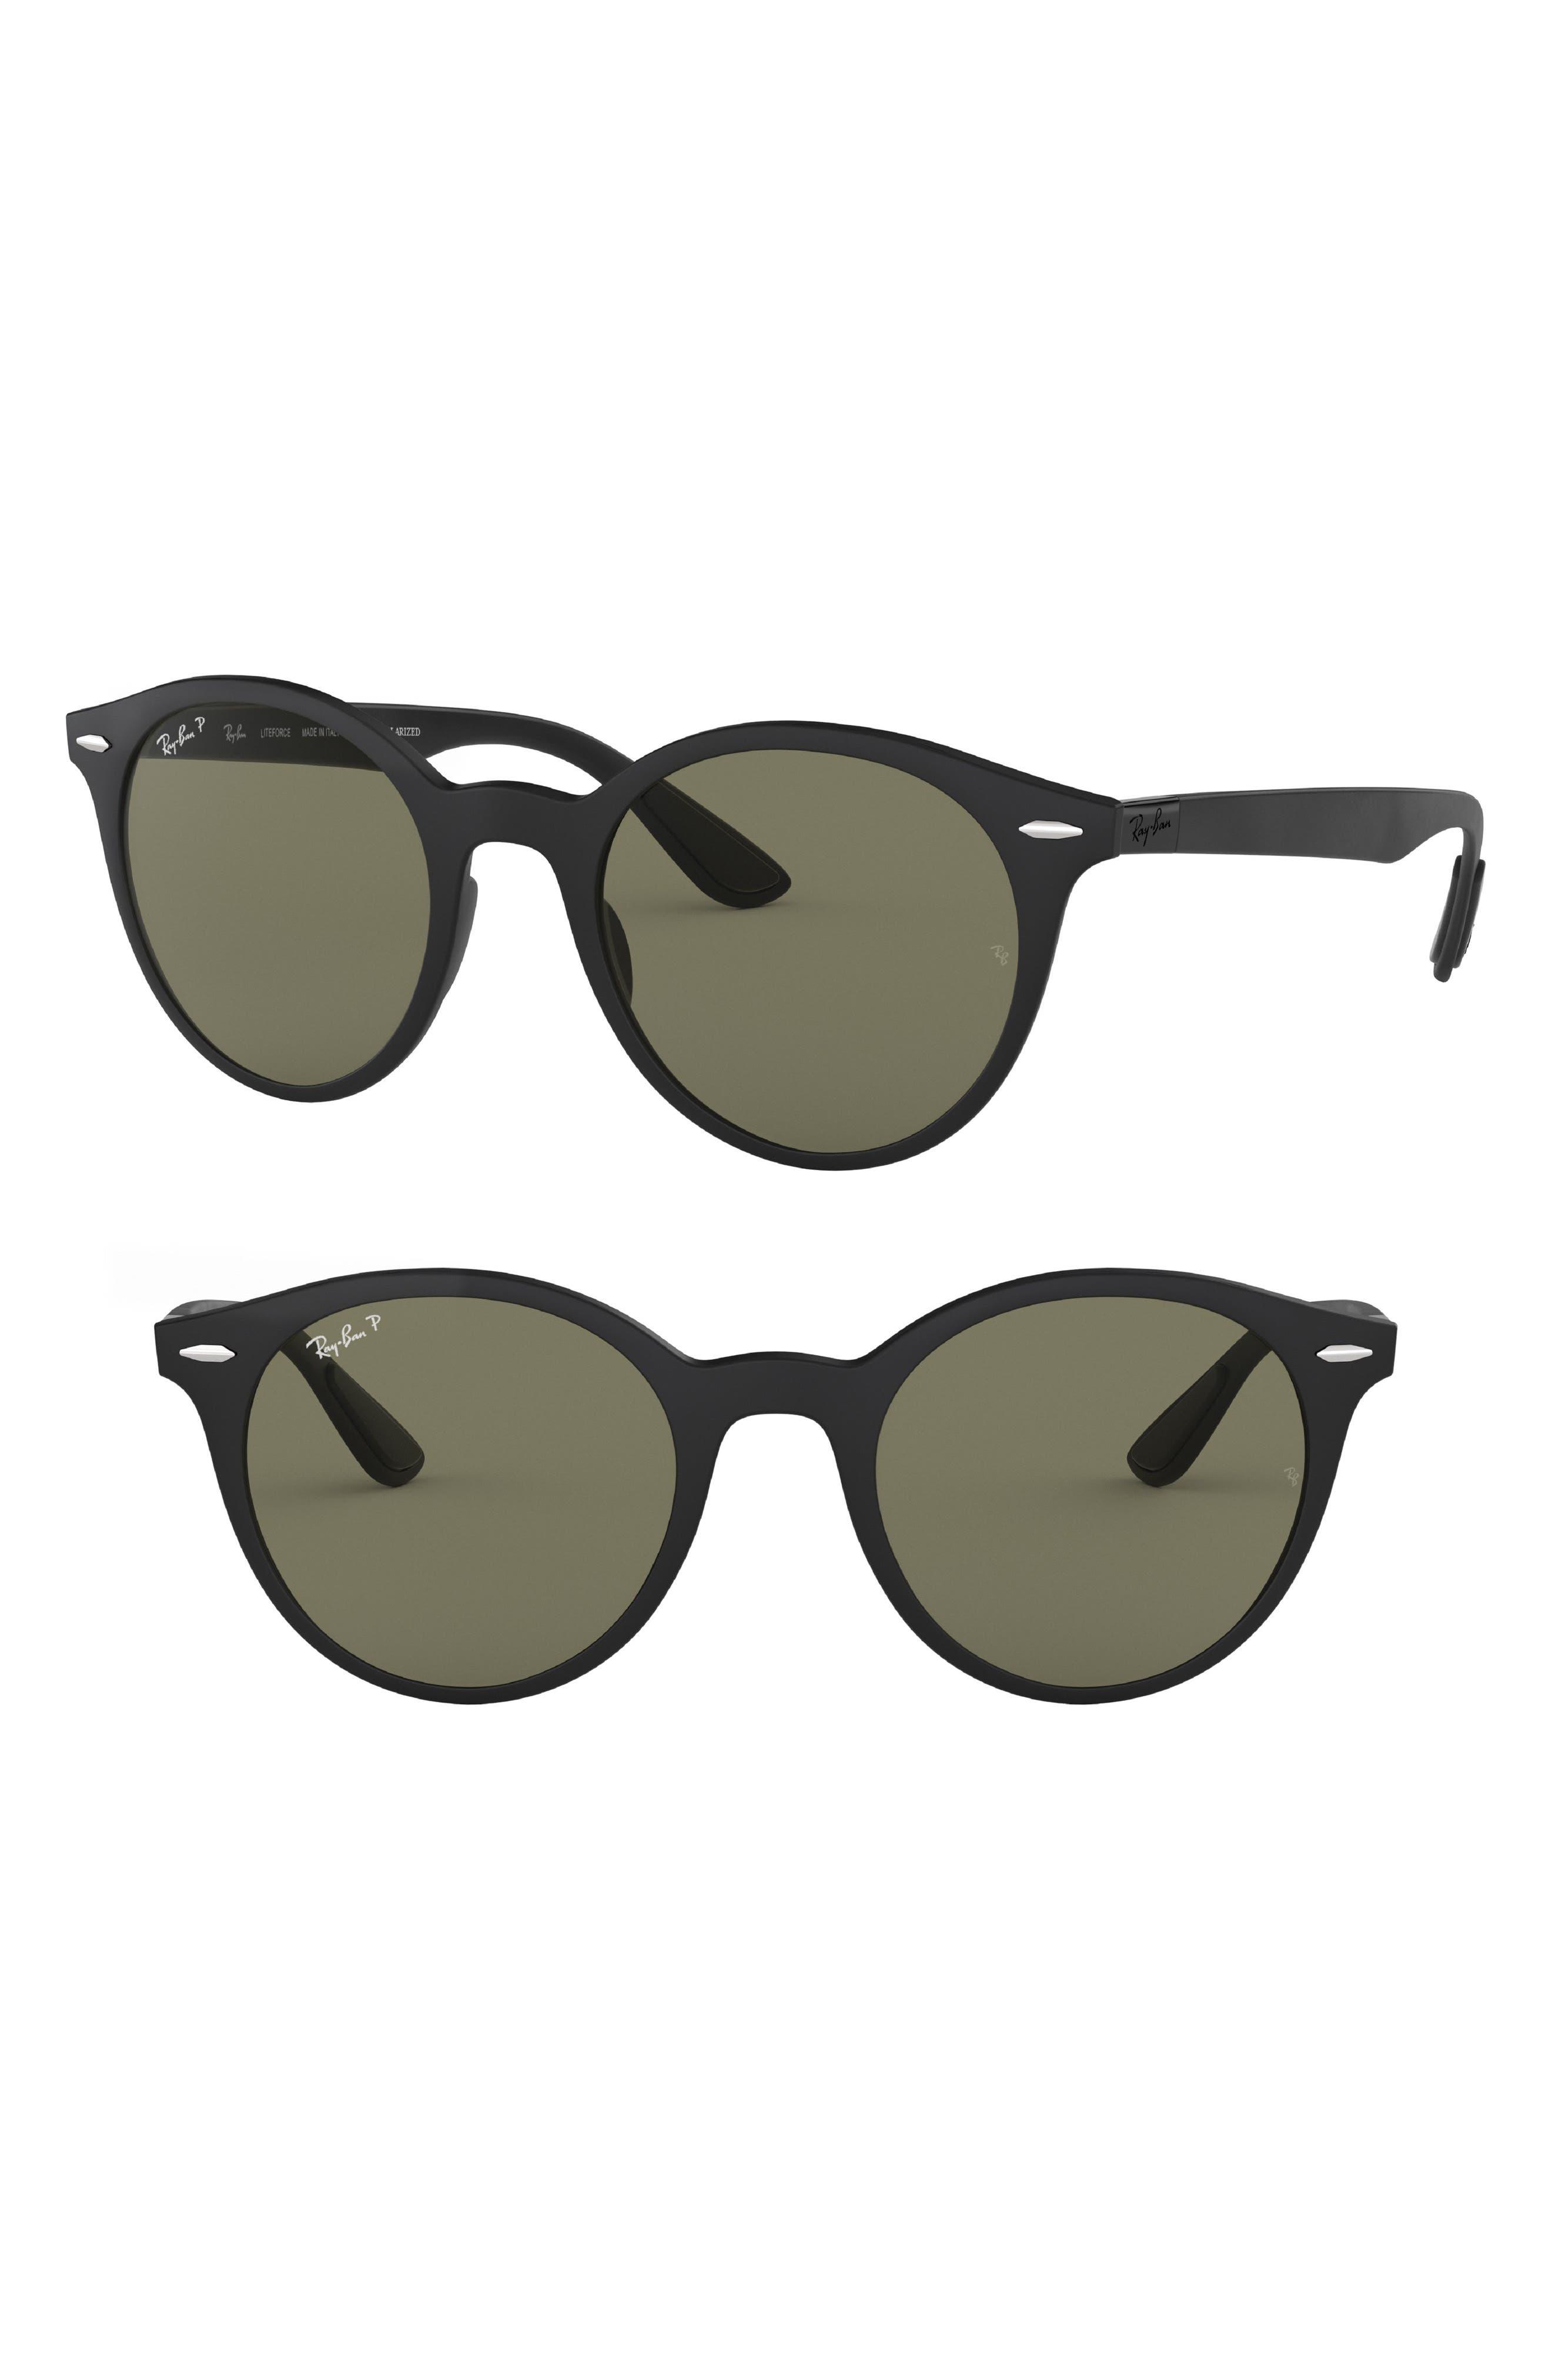 Phantos 50mm Polarized Sunglasses,                             Main thumbnail 1, color,                             MATTE BLACK